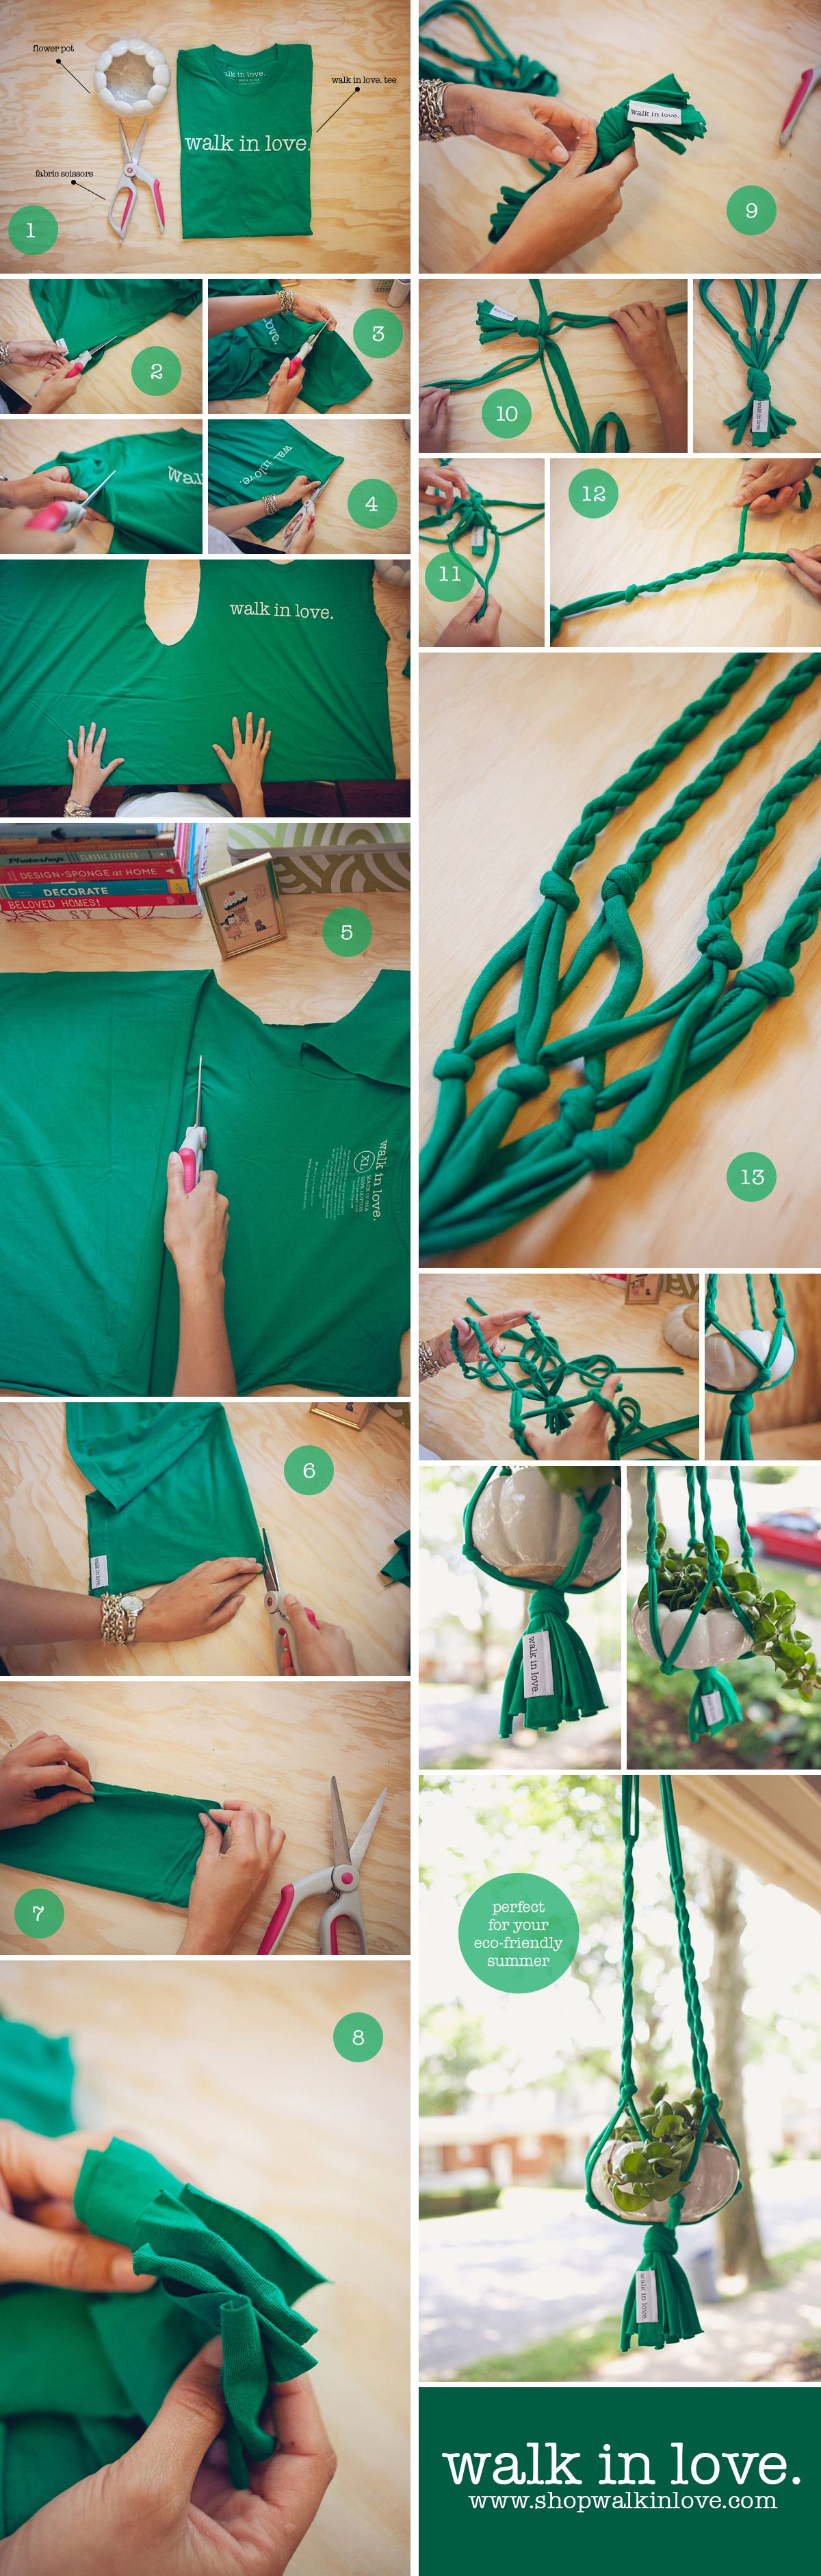 Gran idea para #reciclar vuestras #camisetas! DIY T-shirt plant hanger.